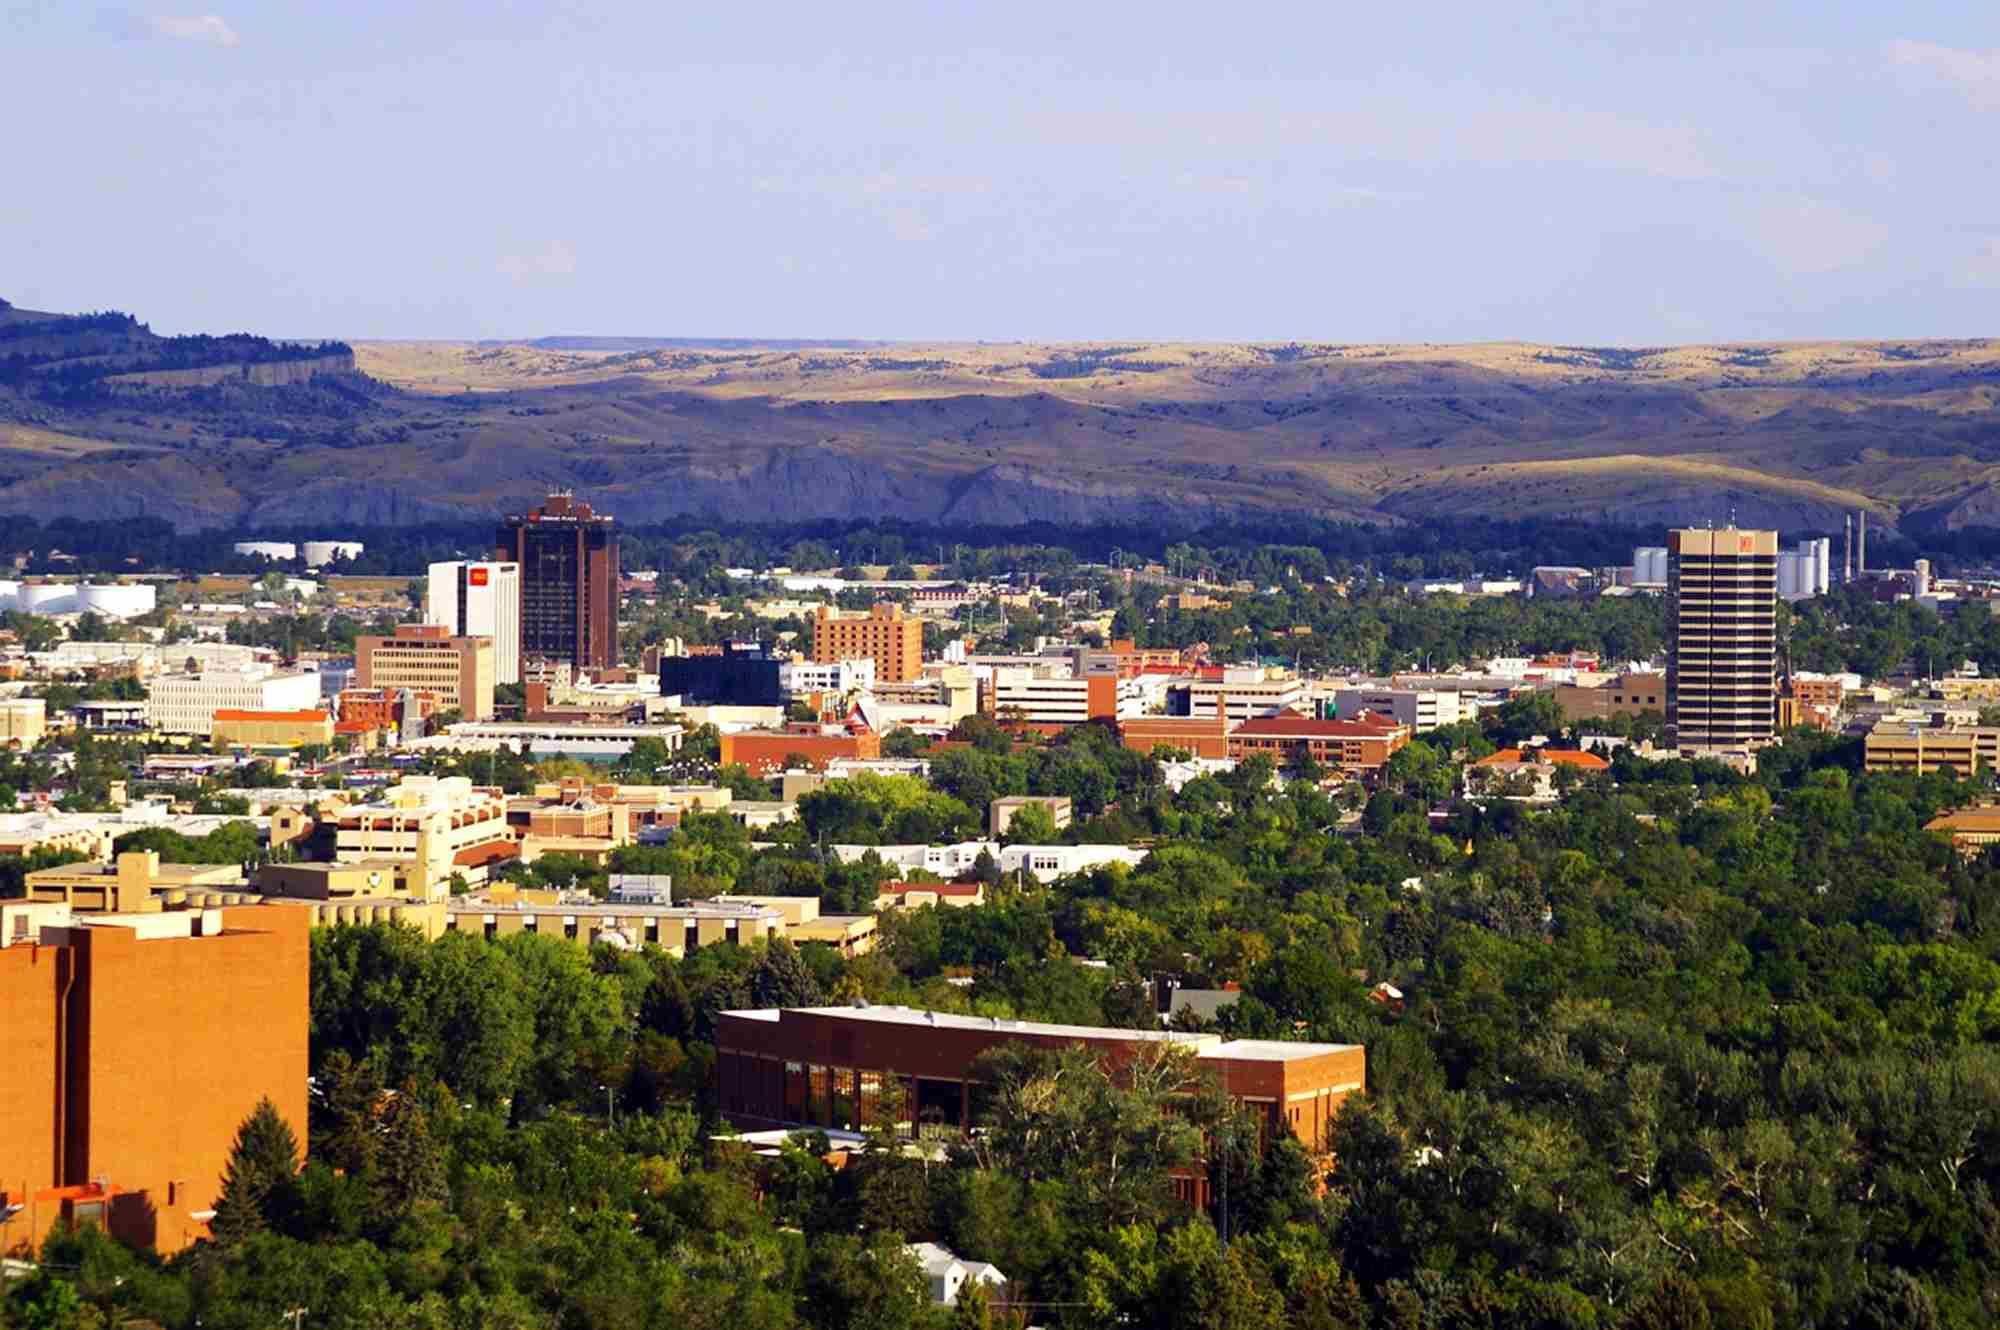 Vista de Billings Montana